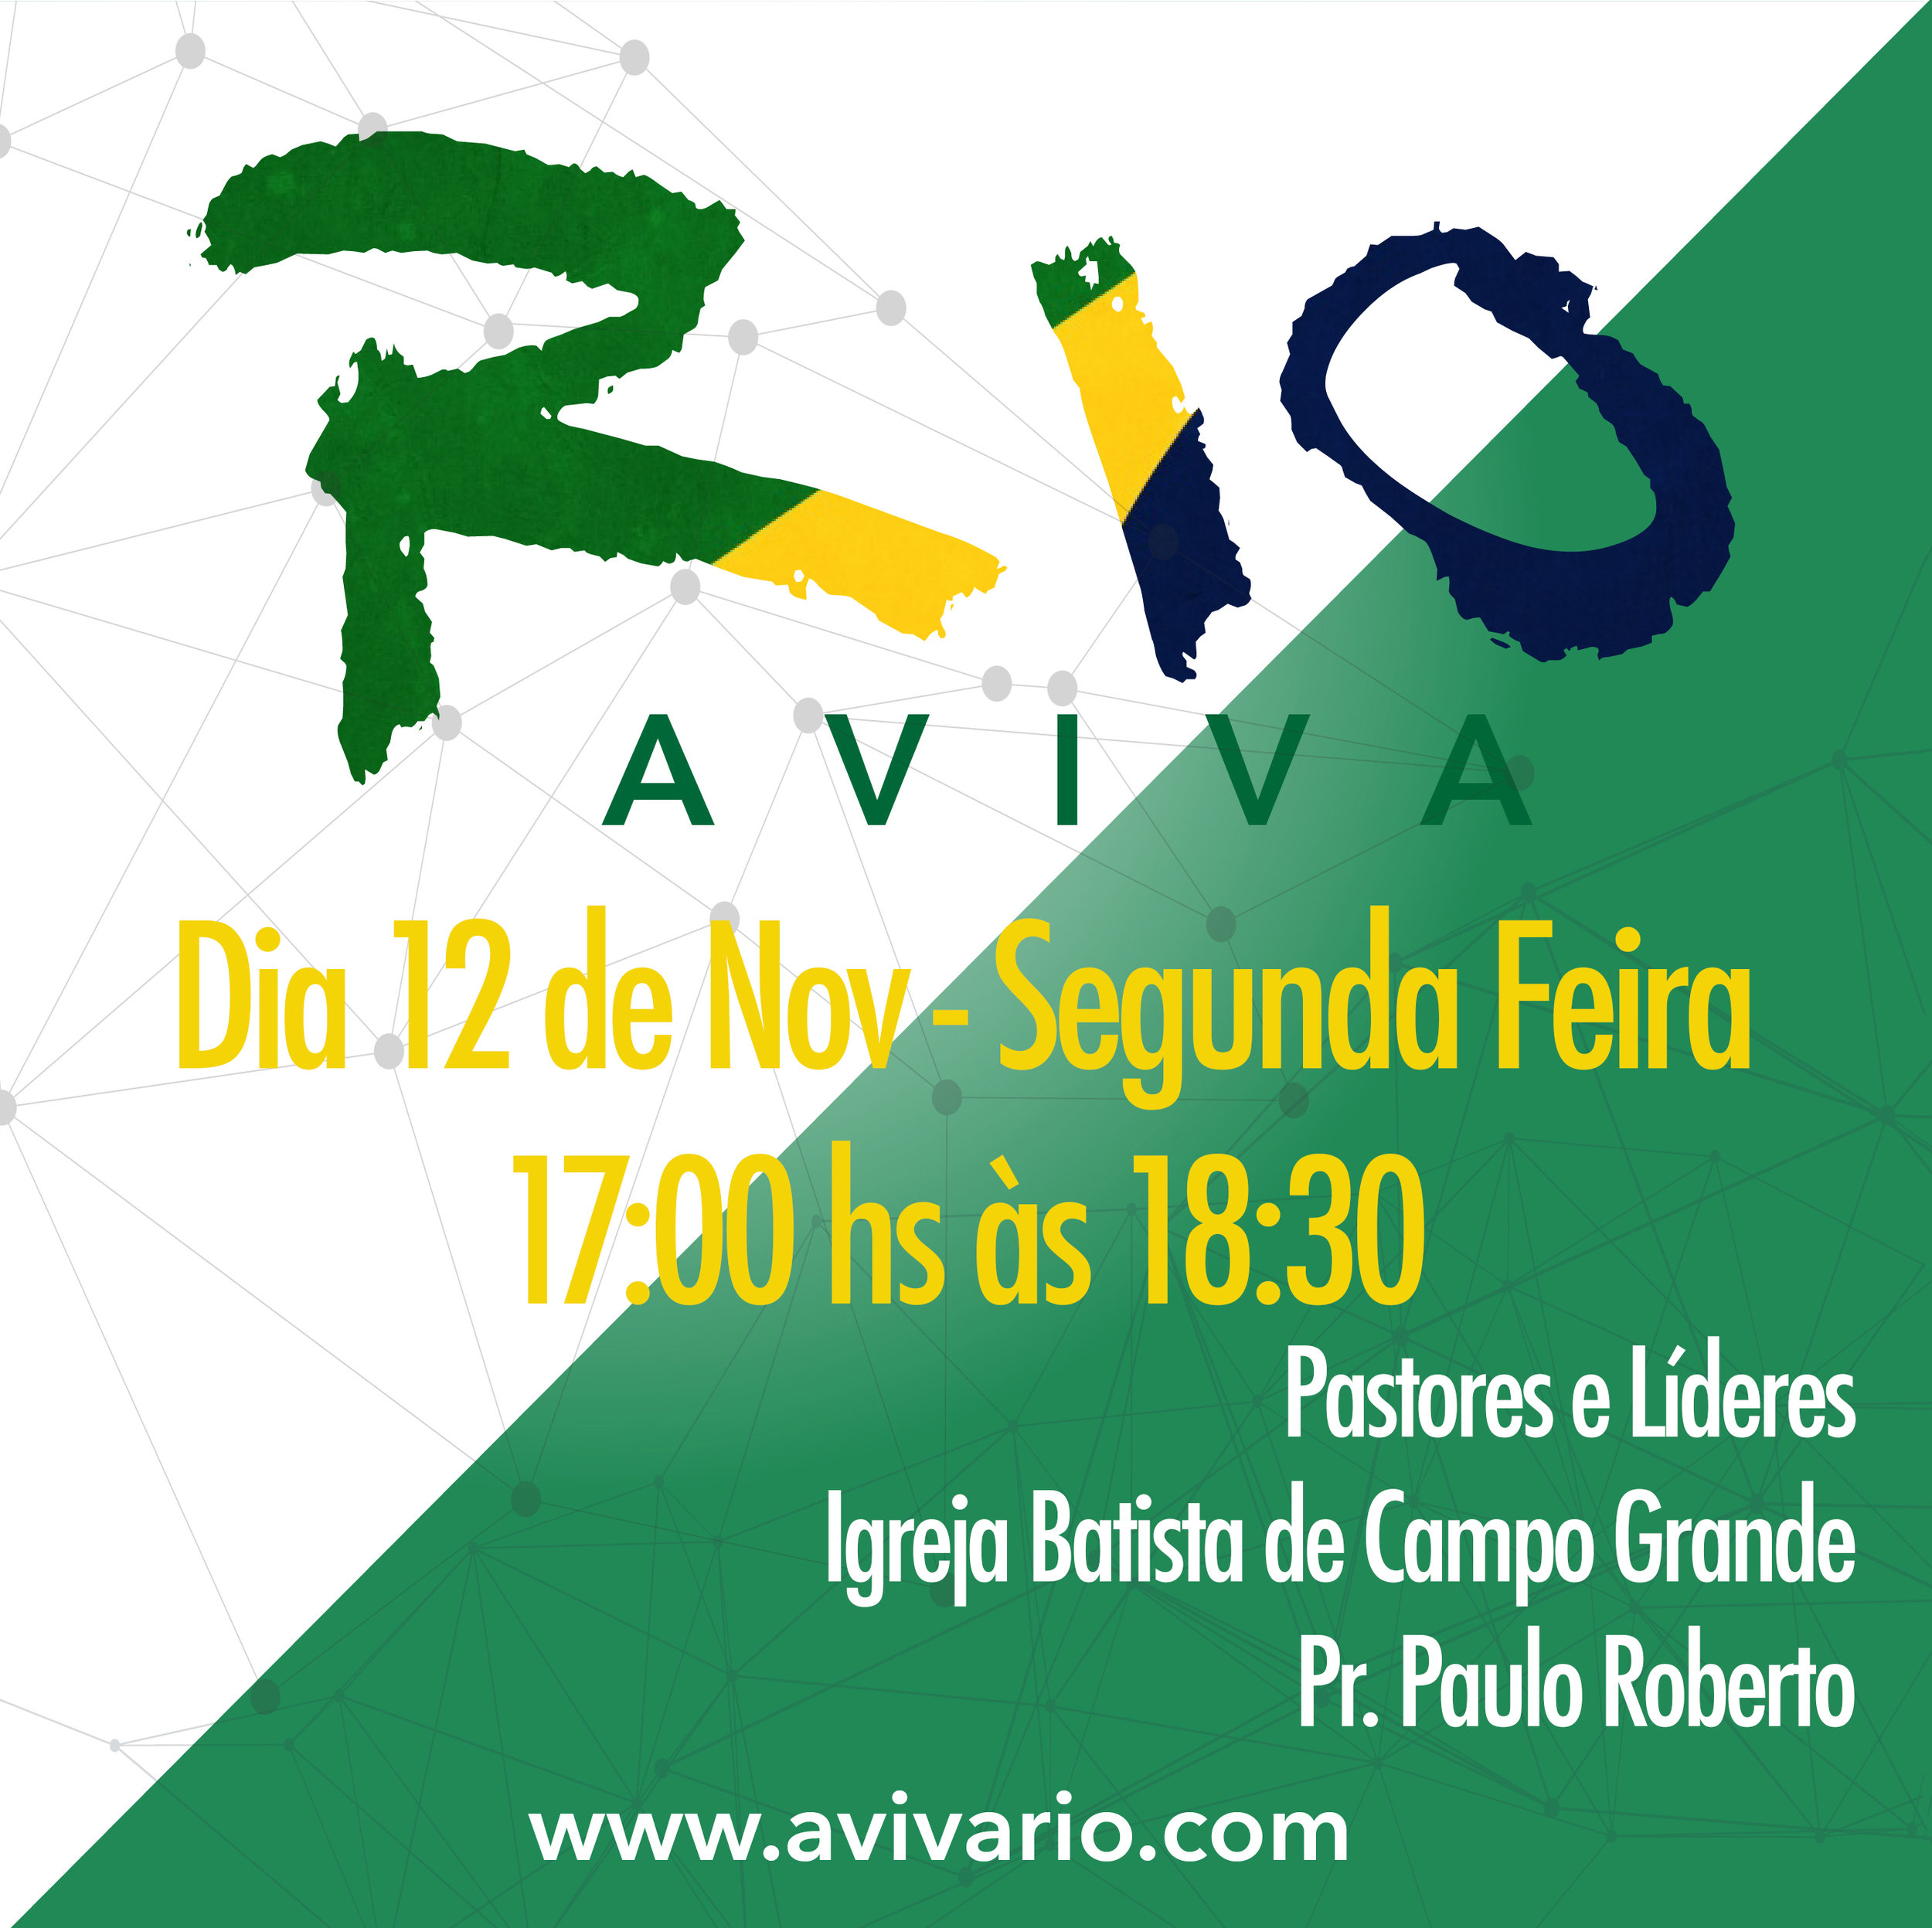 RioRevived-Monday-PM-IG-Portuguese-1.jpg